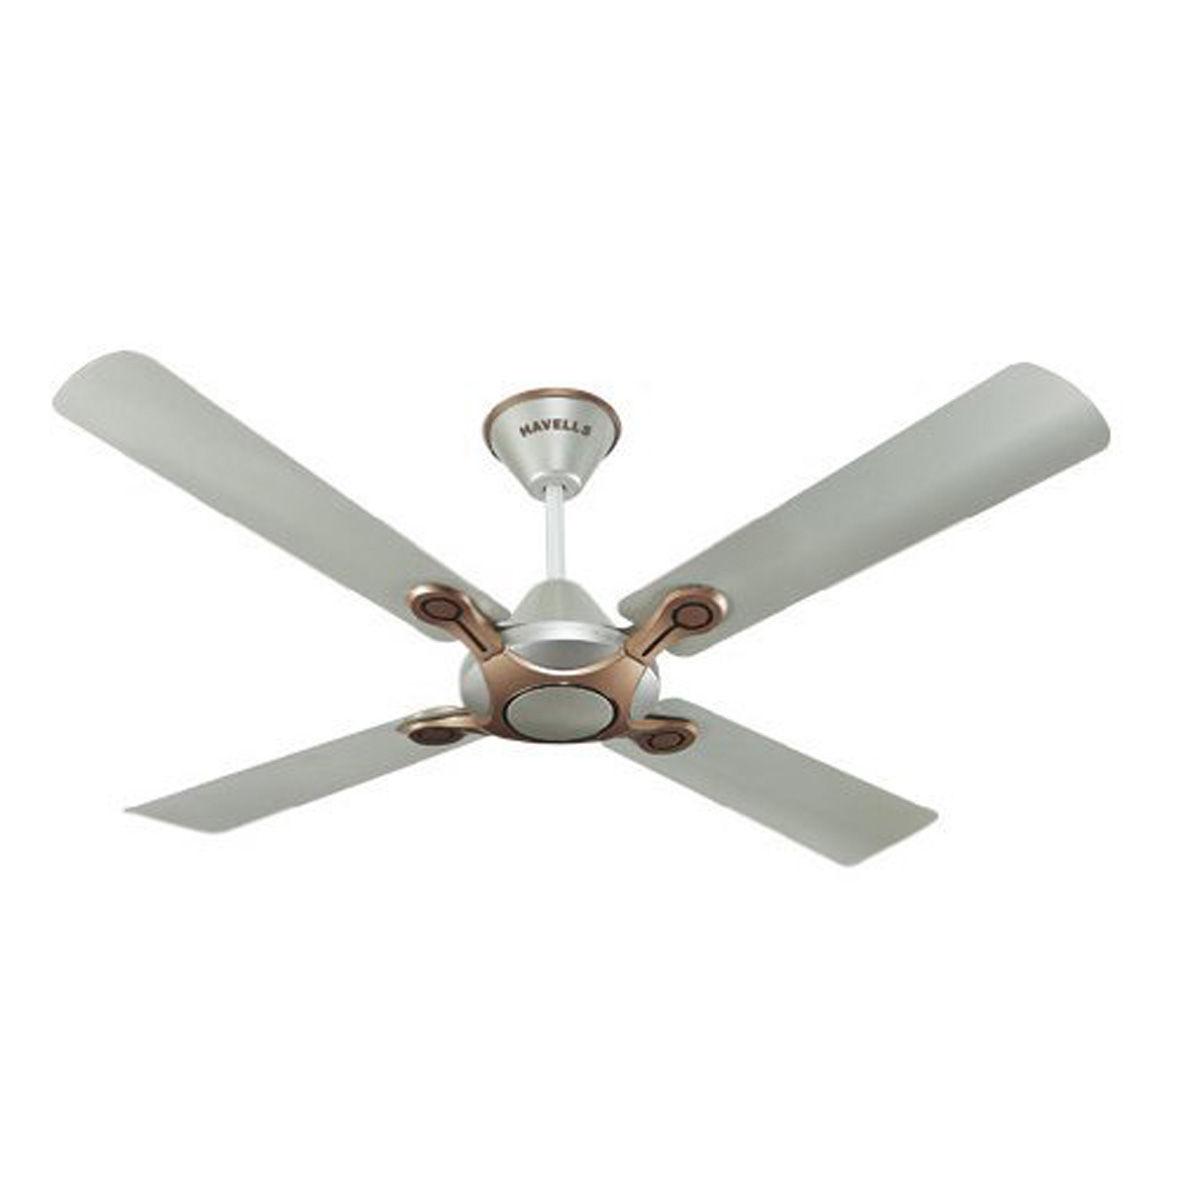 Havells Leganza Ceiling Fan